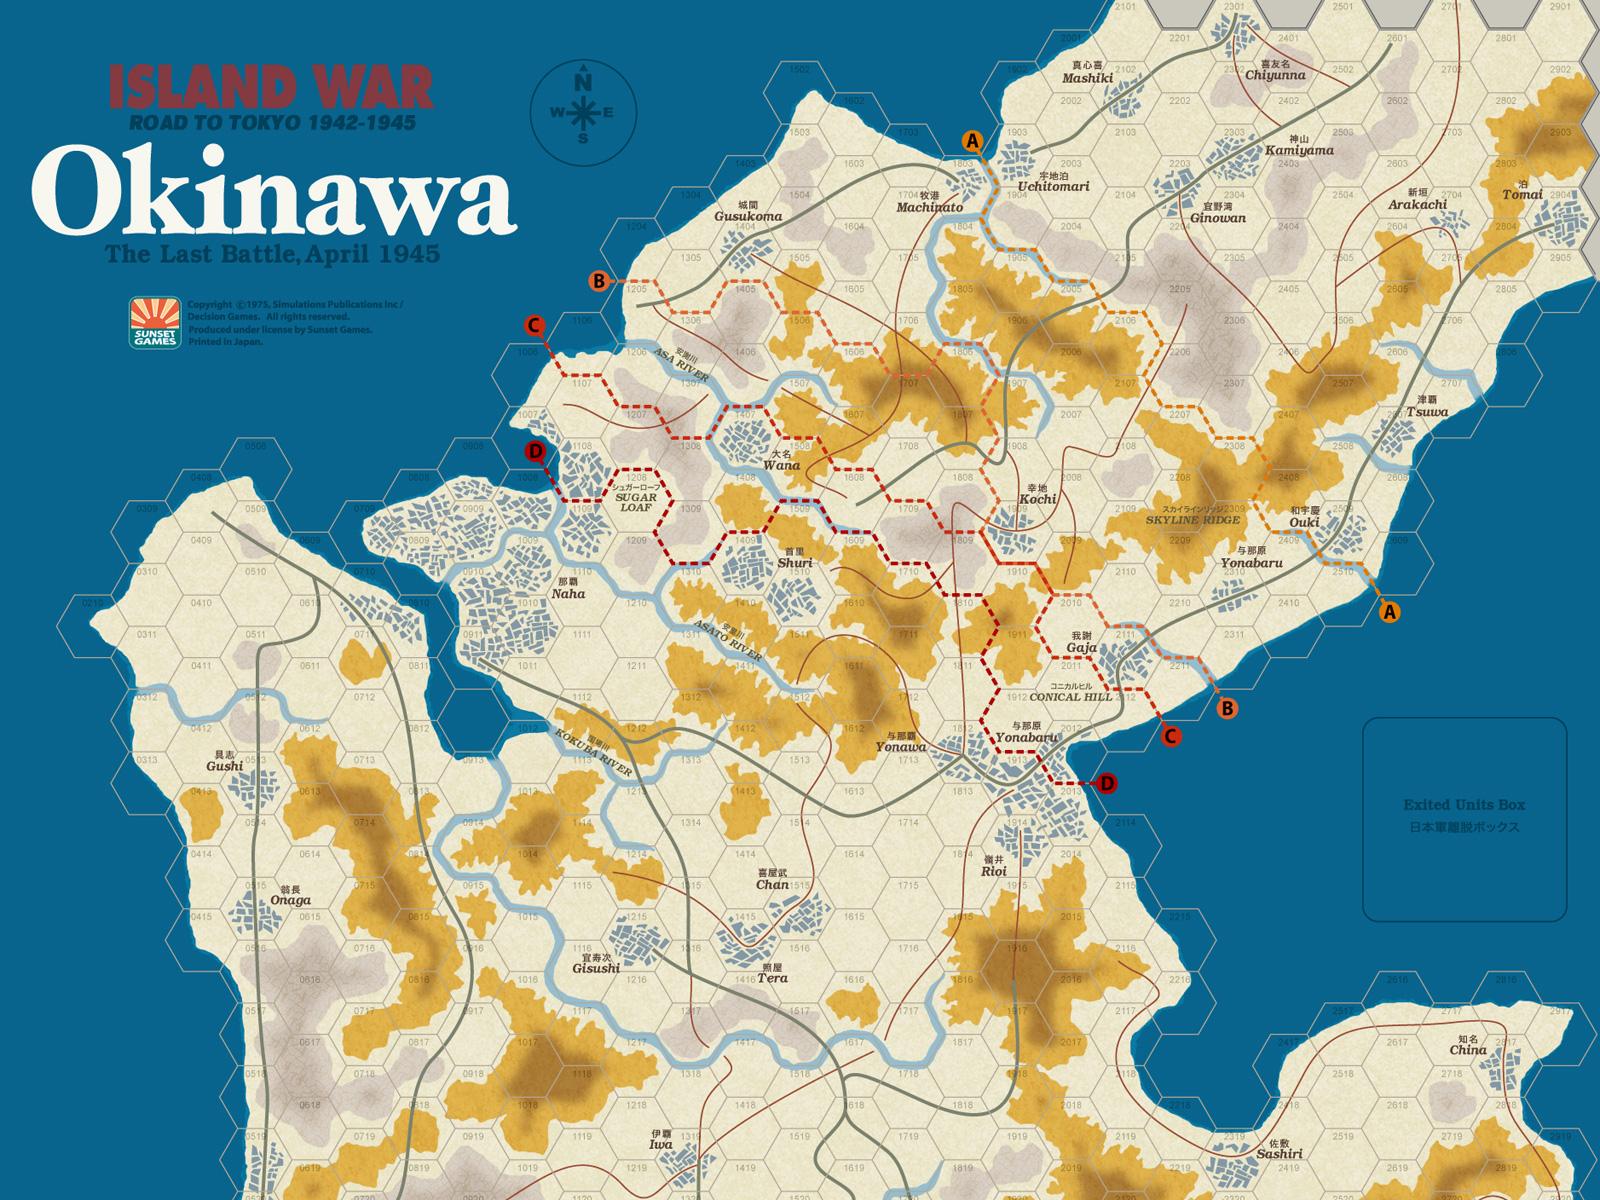 Okinawamap03n